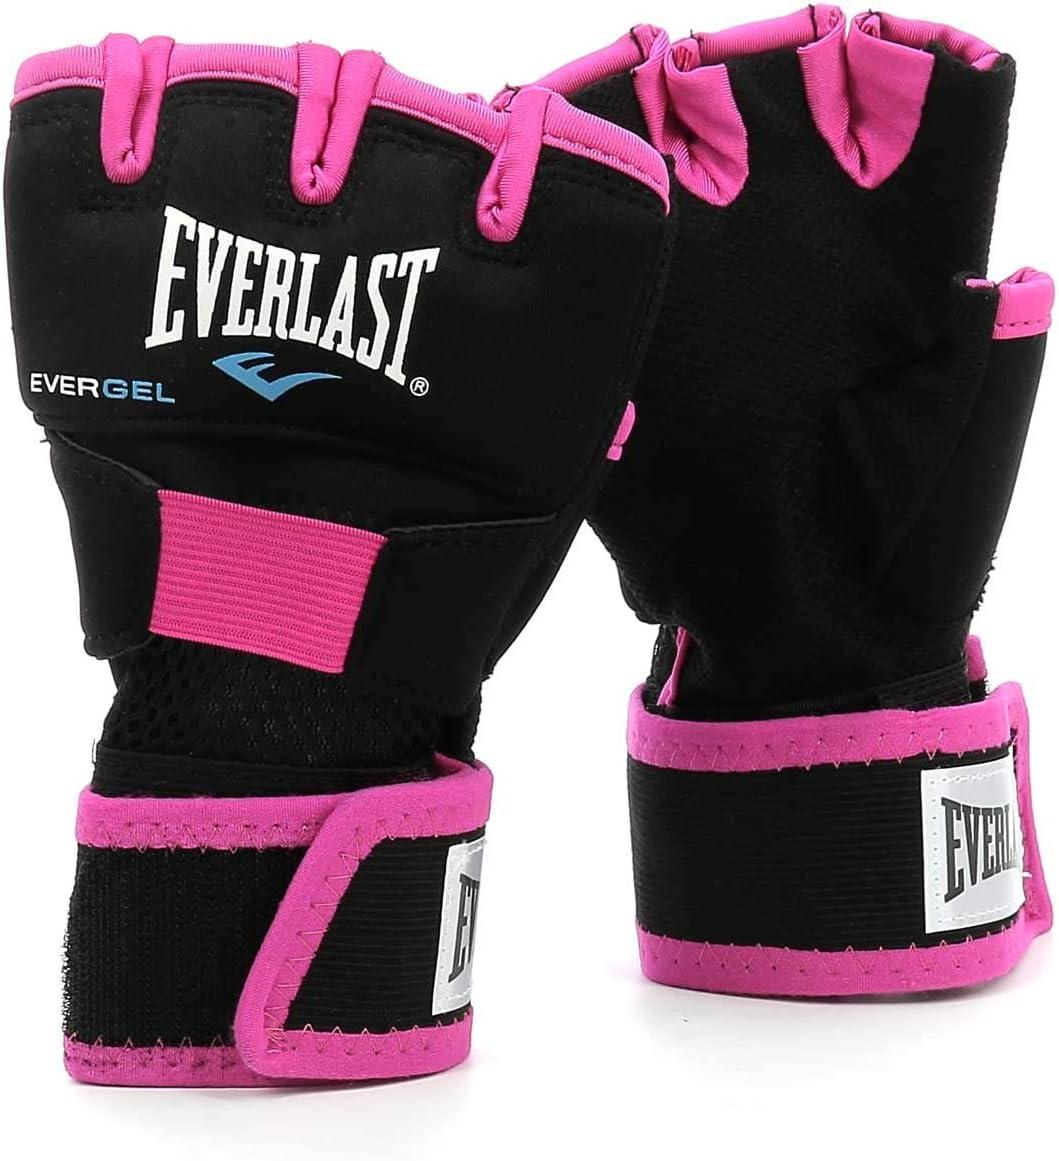 Everlast P00000736 Elegant Evergel Handwraps S Large-scale sale Pink Black M